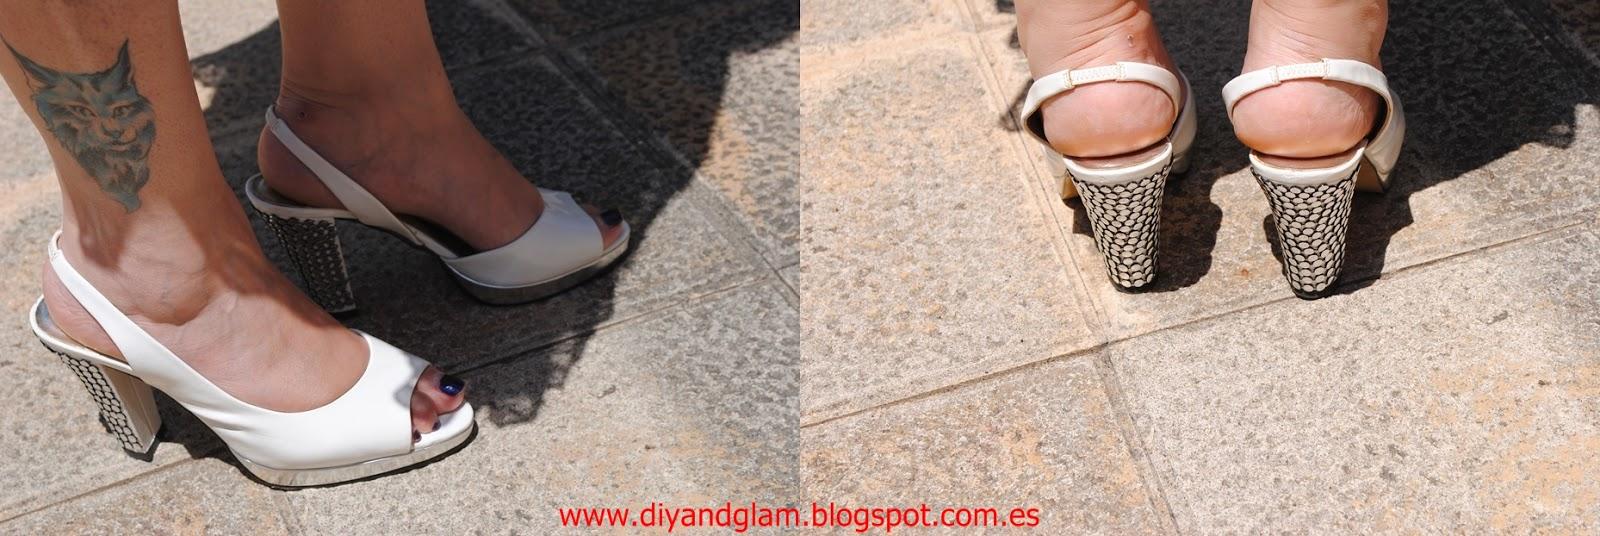 Diy sandalias con tachuelas